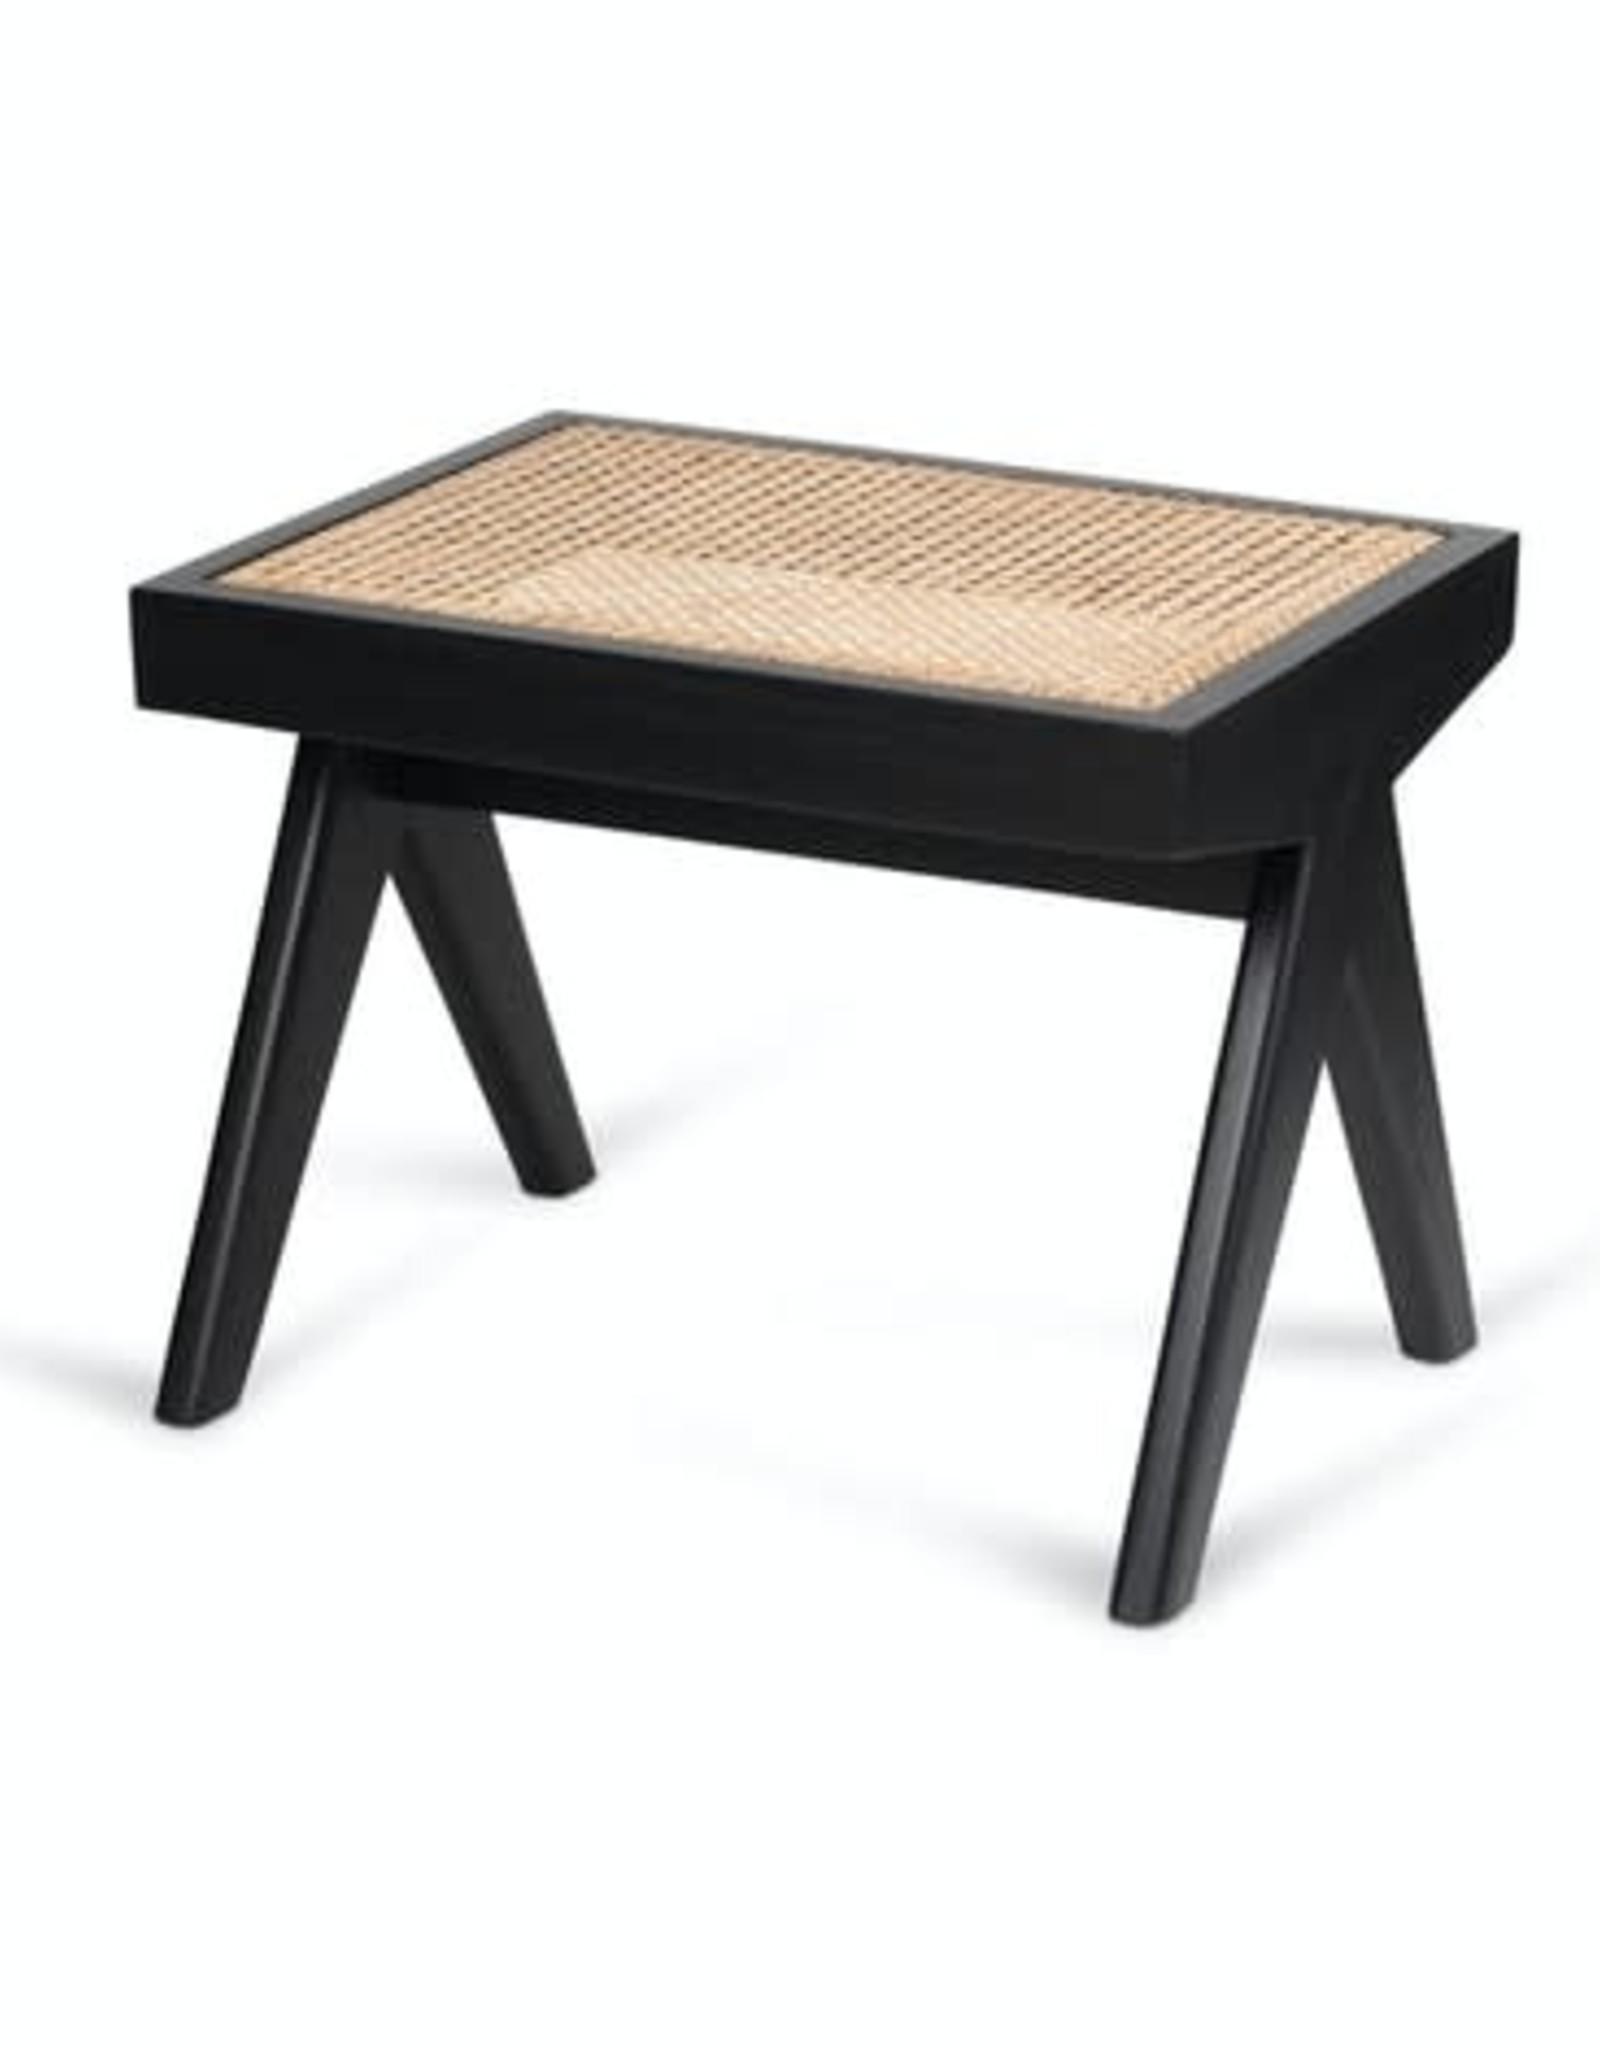 Detjer Footstool Chandigarh -  zwart